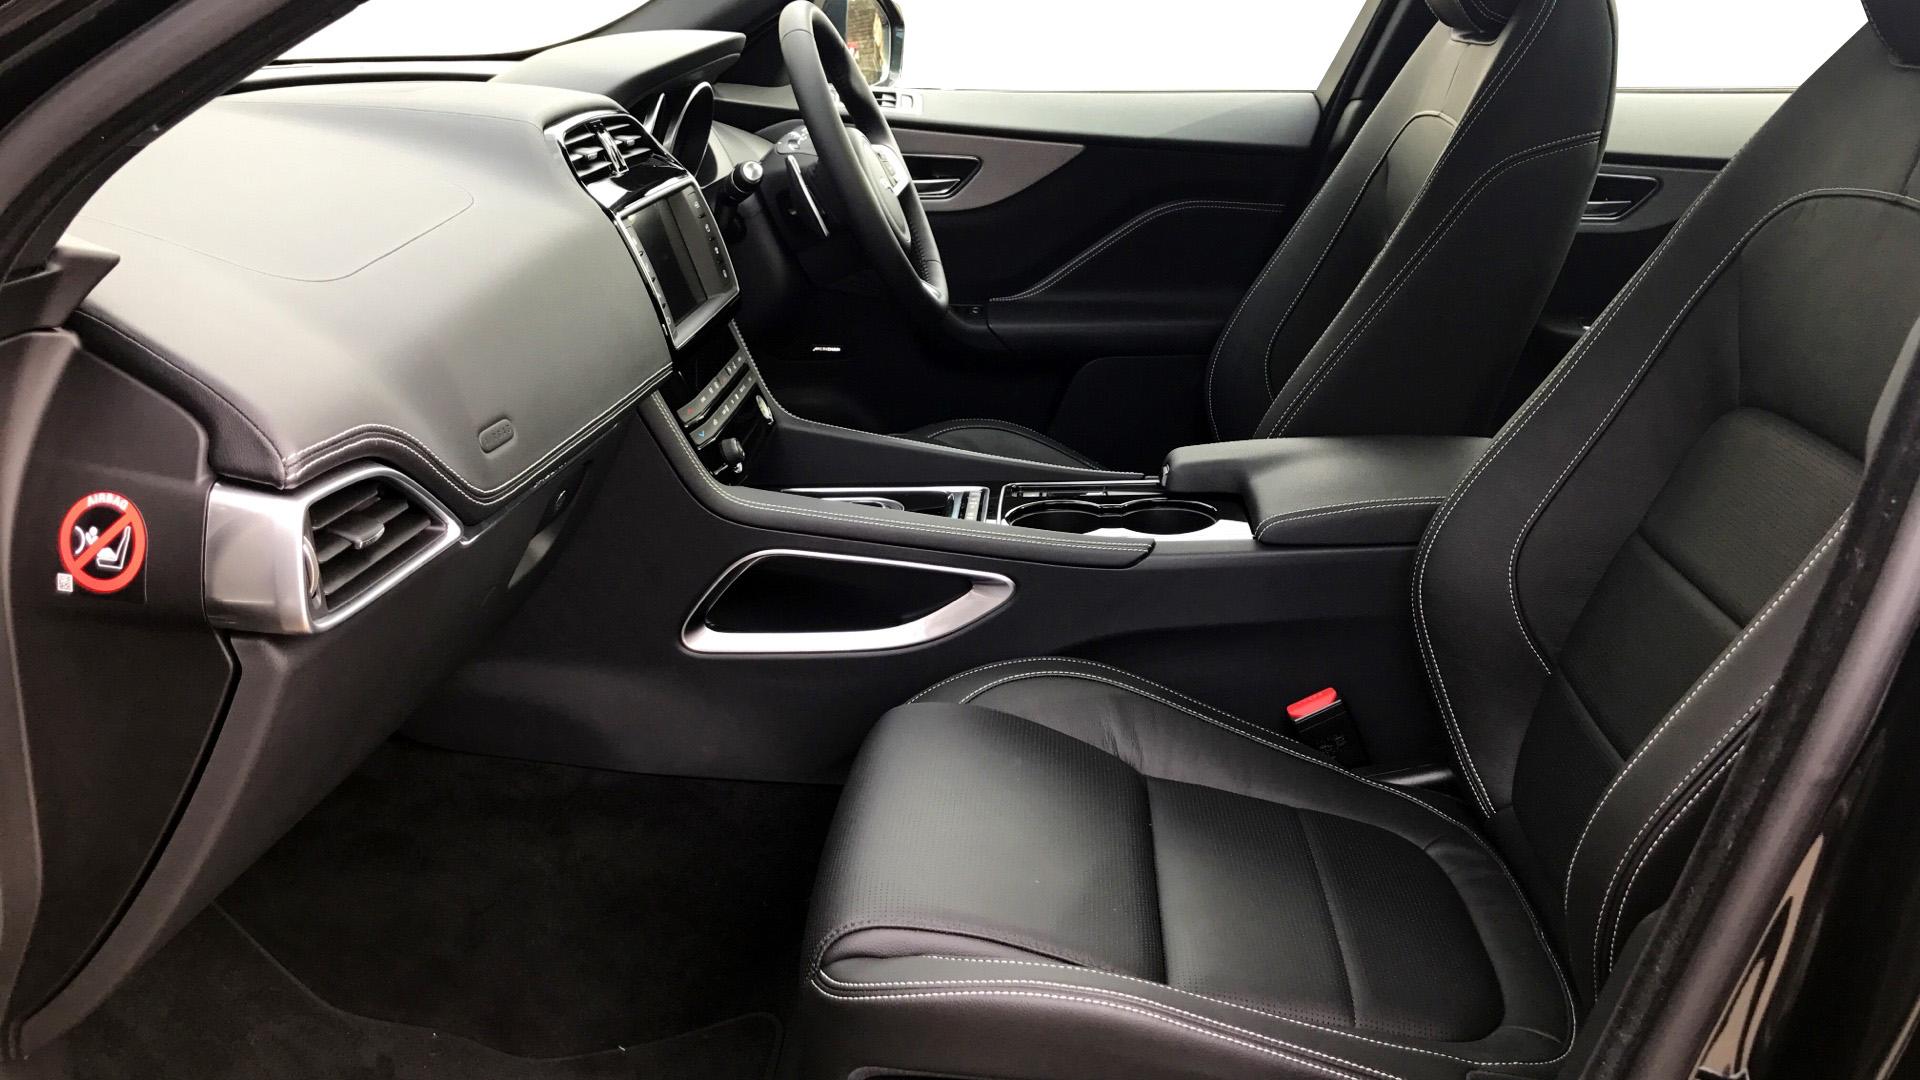 Used Jaguar F Pace 3 0D V6 S 5Dr Auto Awd Diesel Estate for Sale